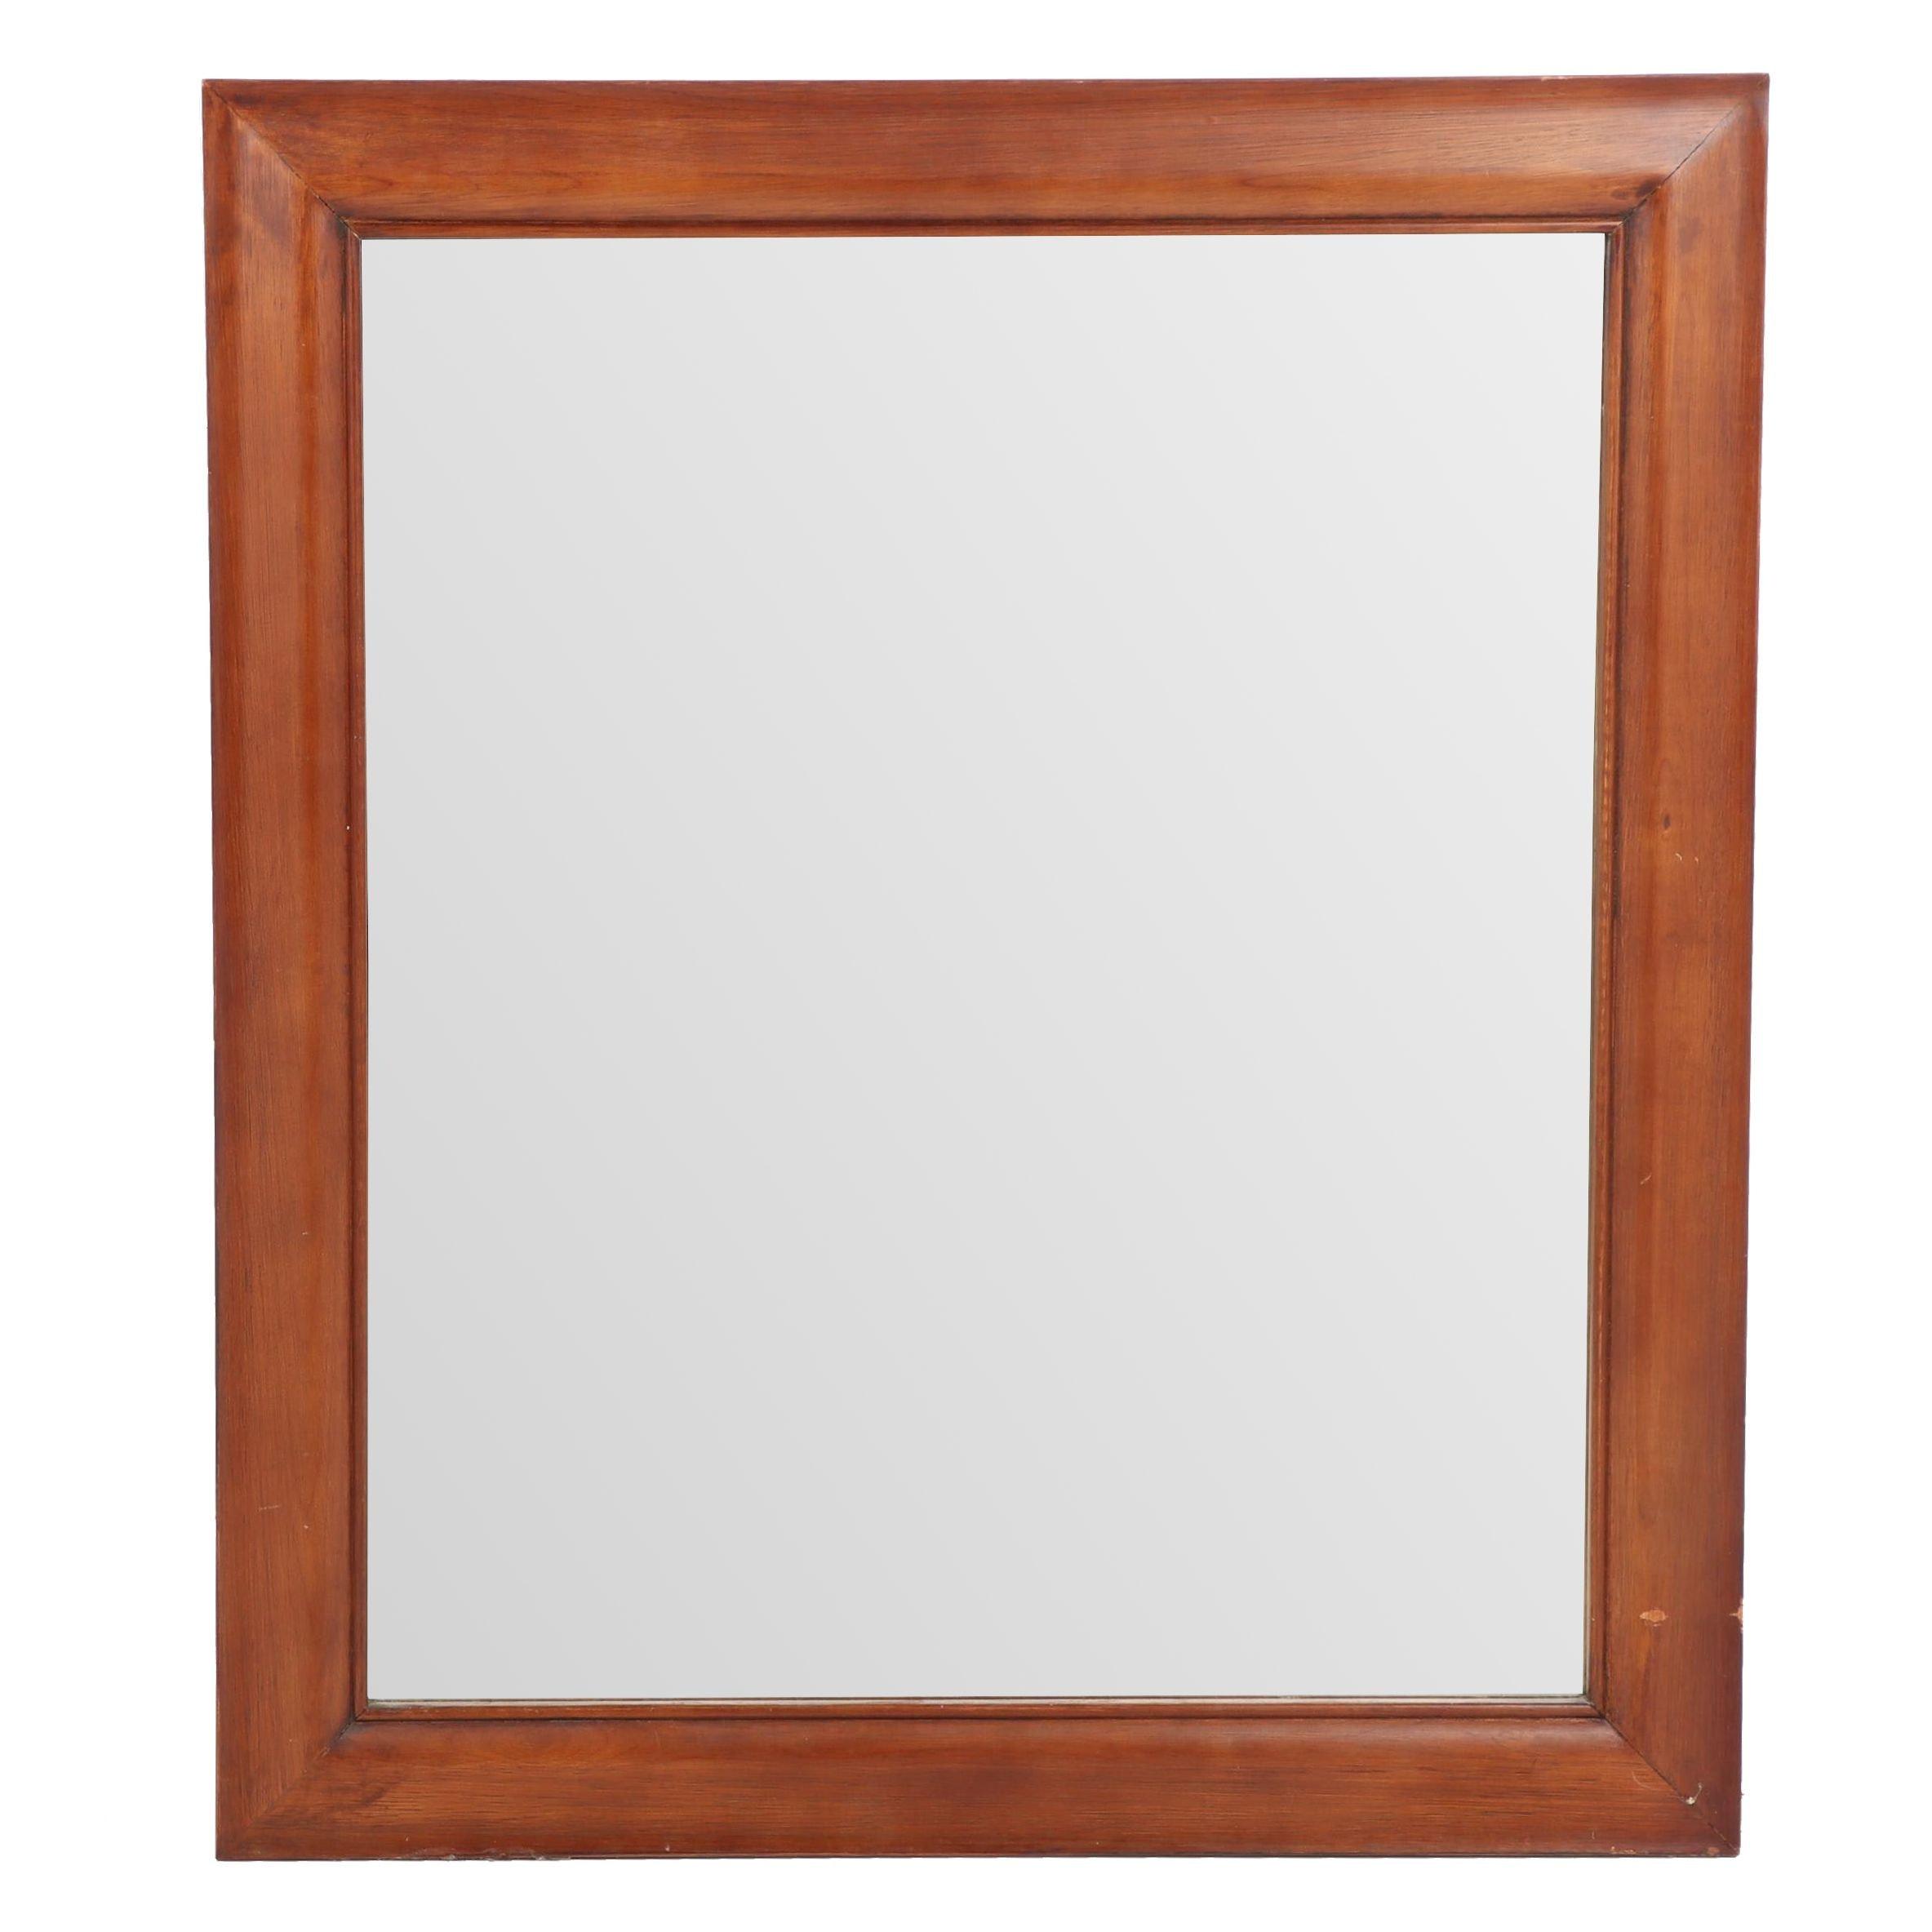 Contemporary Wooden Wall Mirror